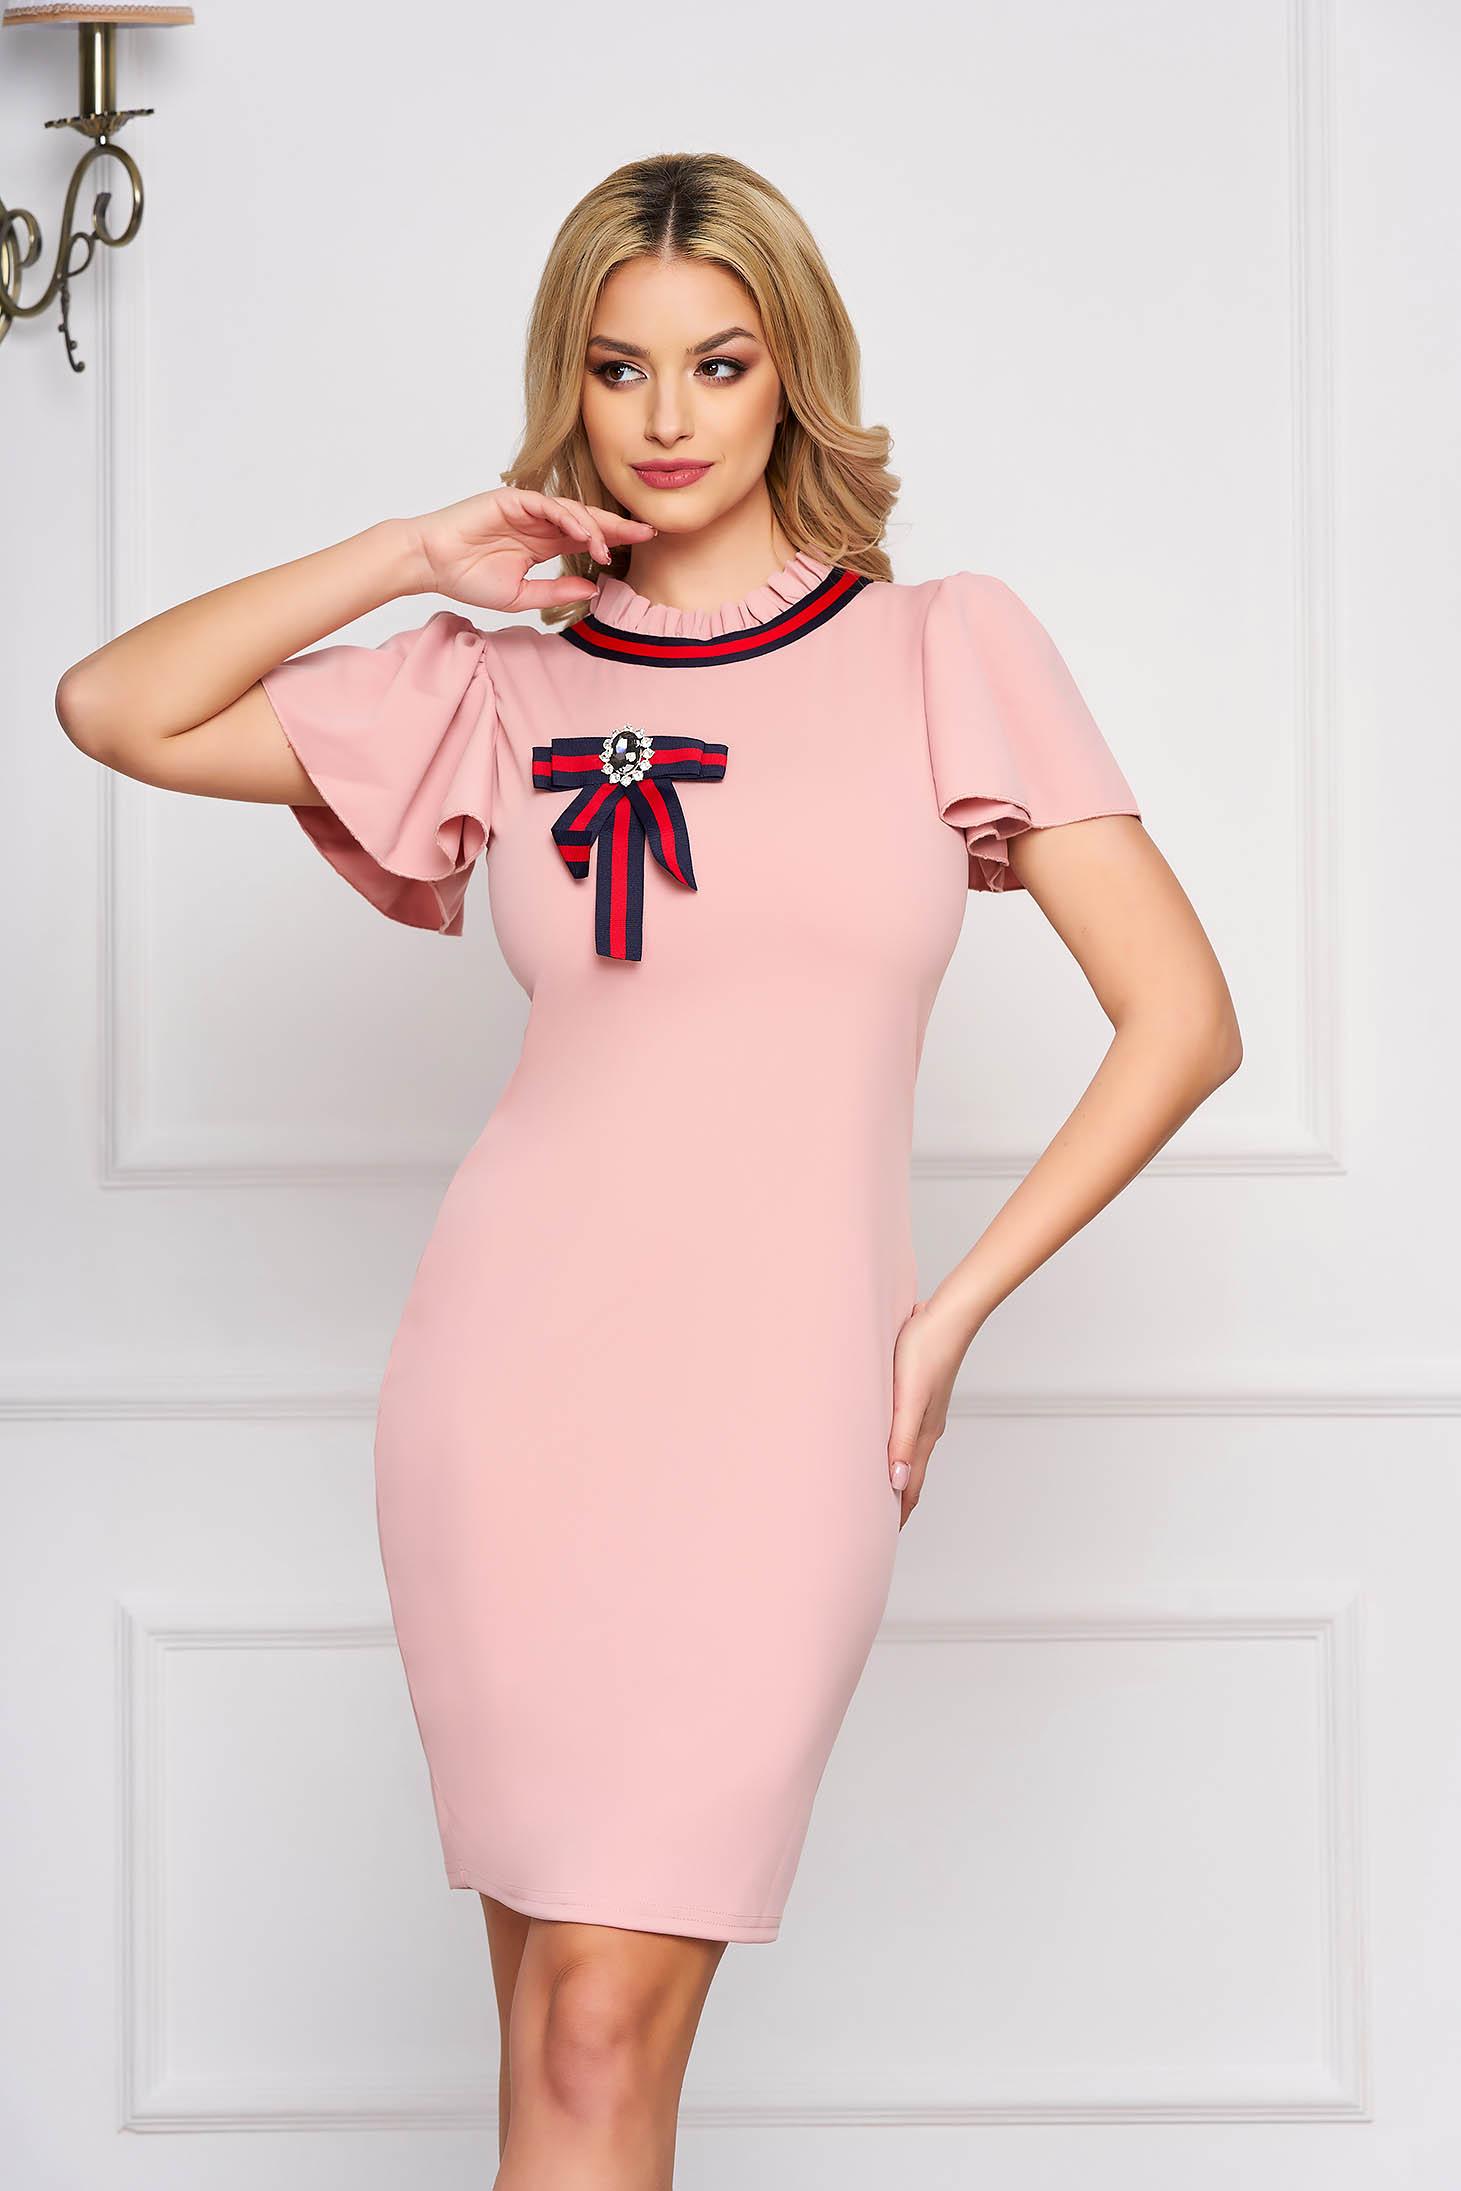 Rochie SunShine roz prafuit eleganta scurta tip creion din stofa cu maneca scurta si accesorizata cu brosa